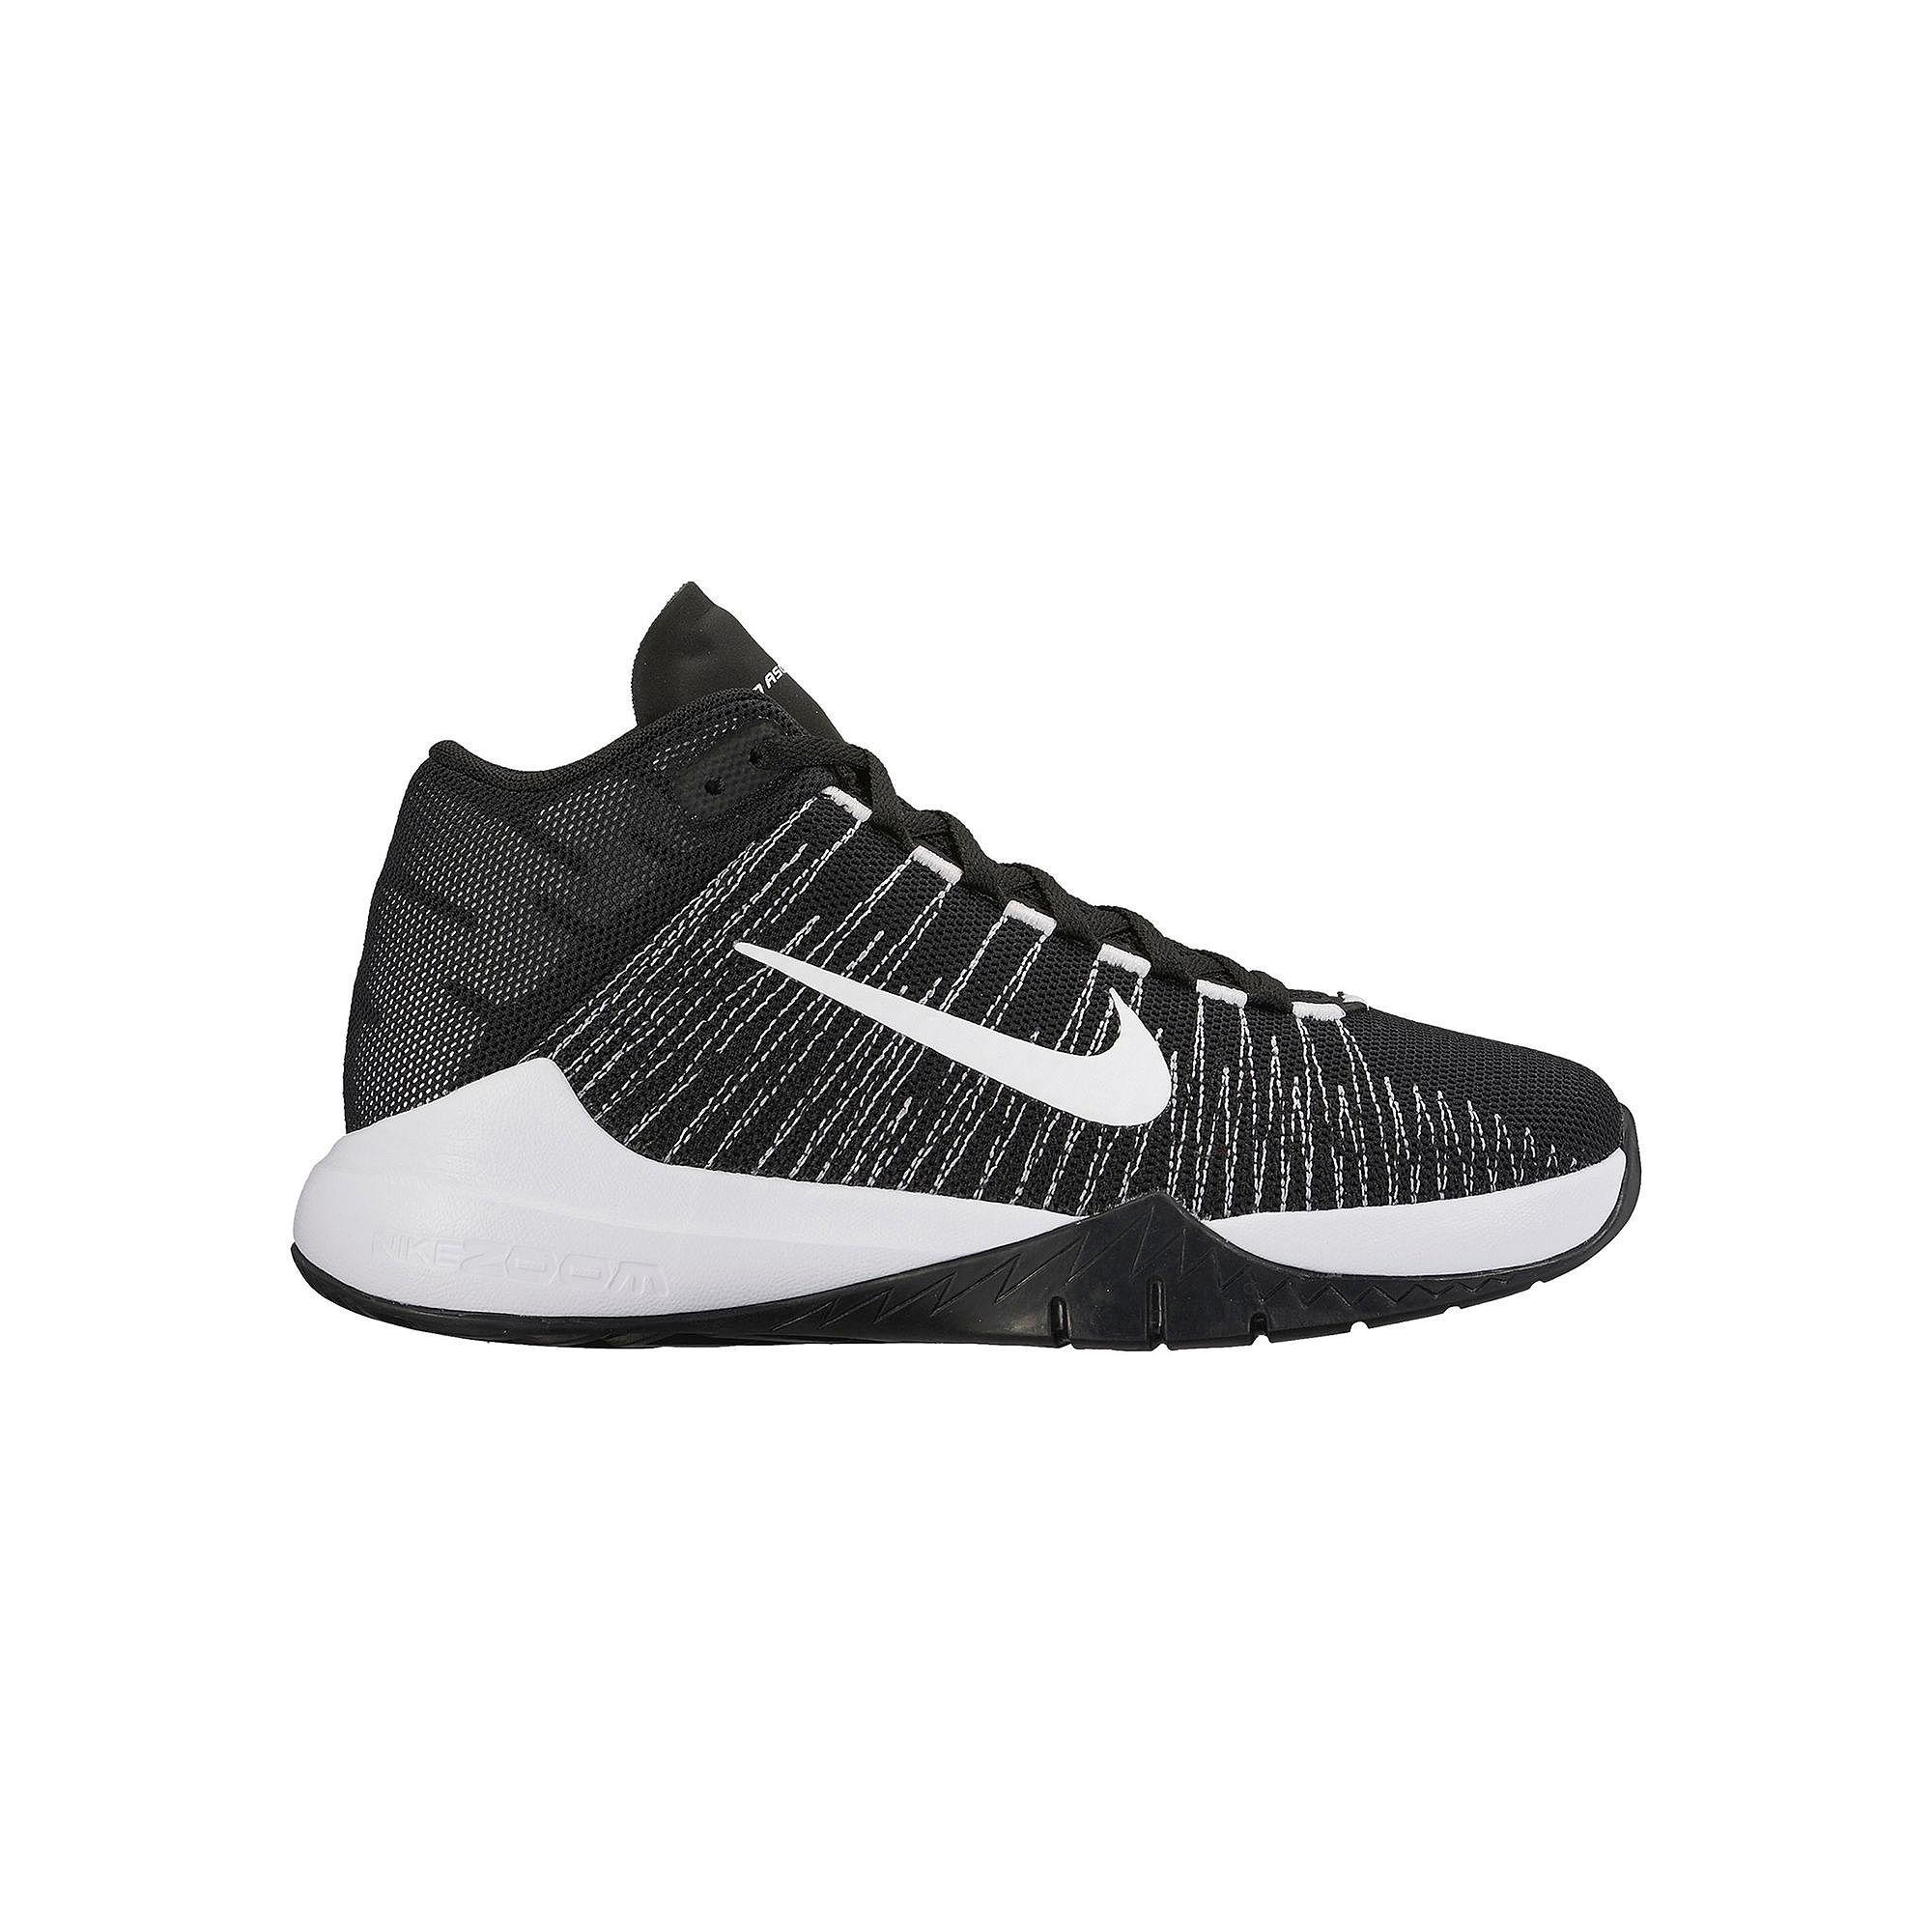 013e0a7e7d67 ... Boy s UPC 886668297903 product image for Nike Zoom Ascention Boys  Basketball Shoes - Big Kids